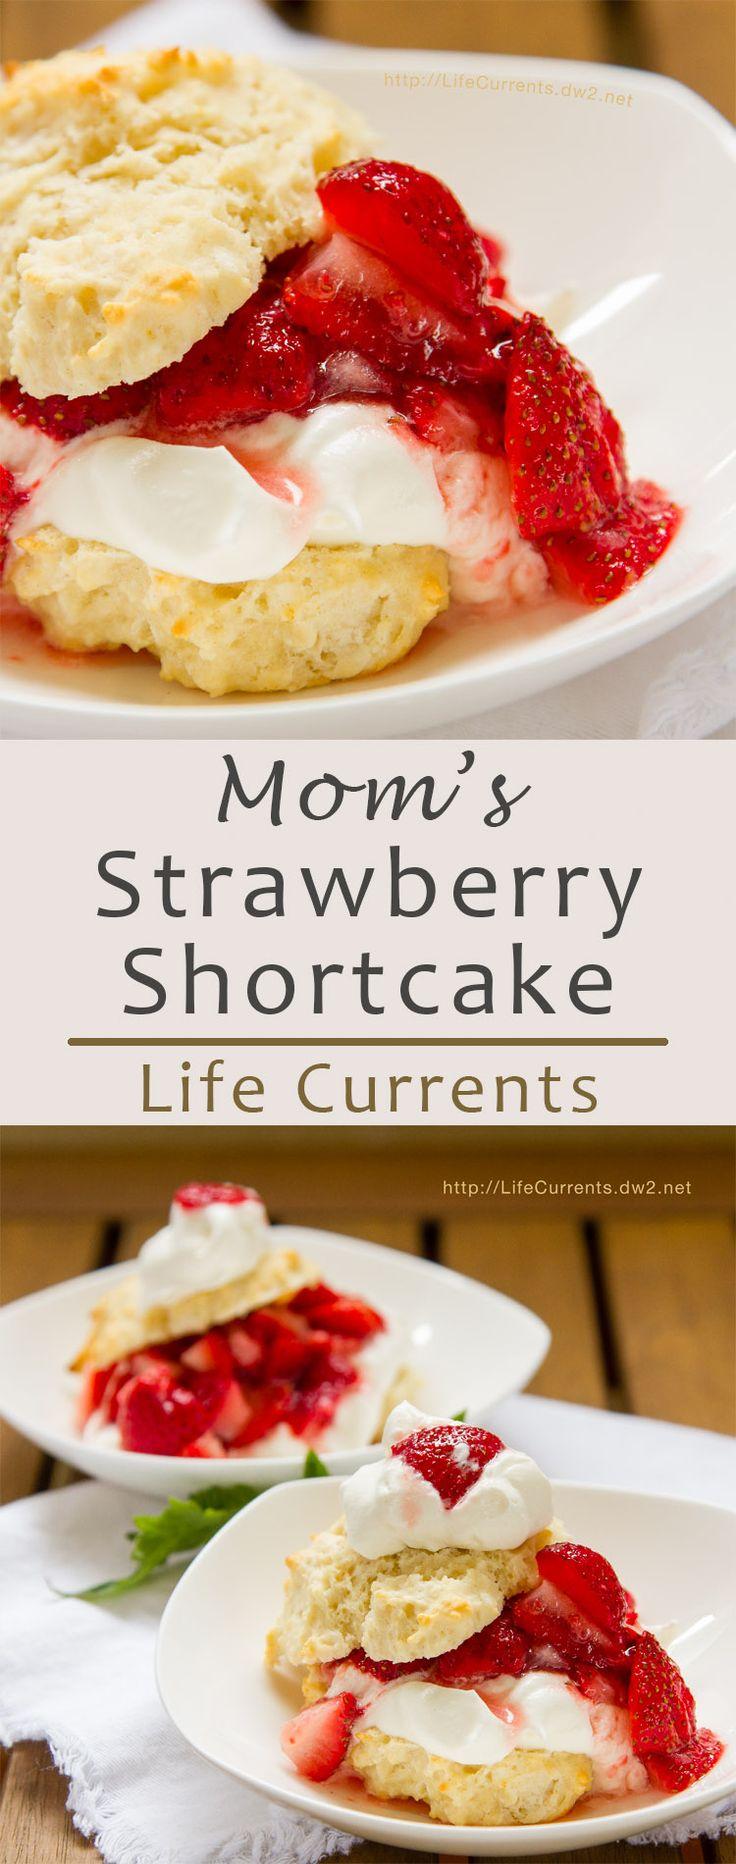 Strawberry shortcake, Strawberries and Mom on Pinterest